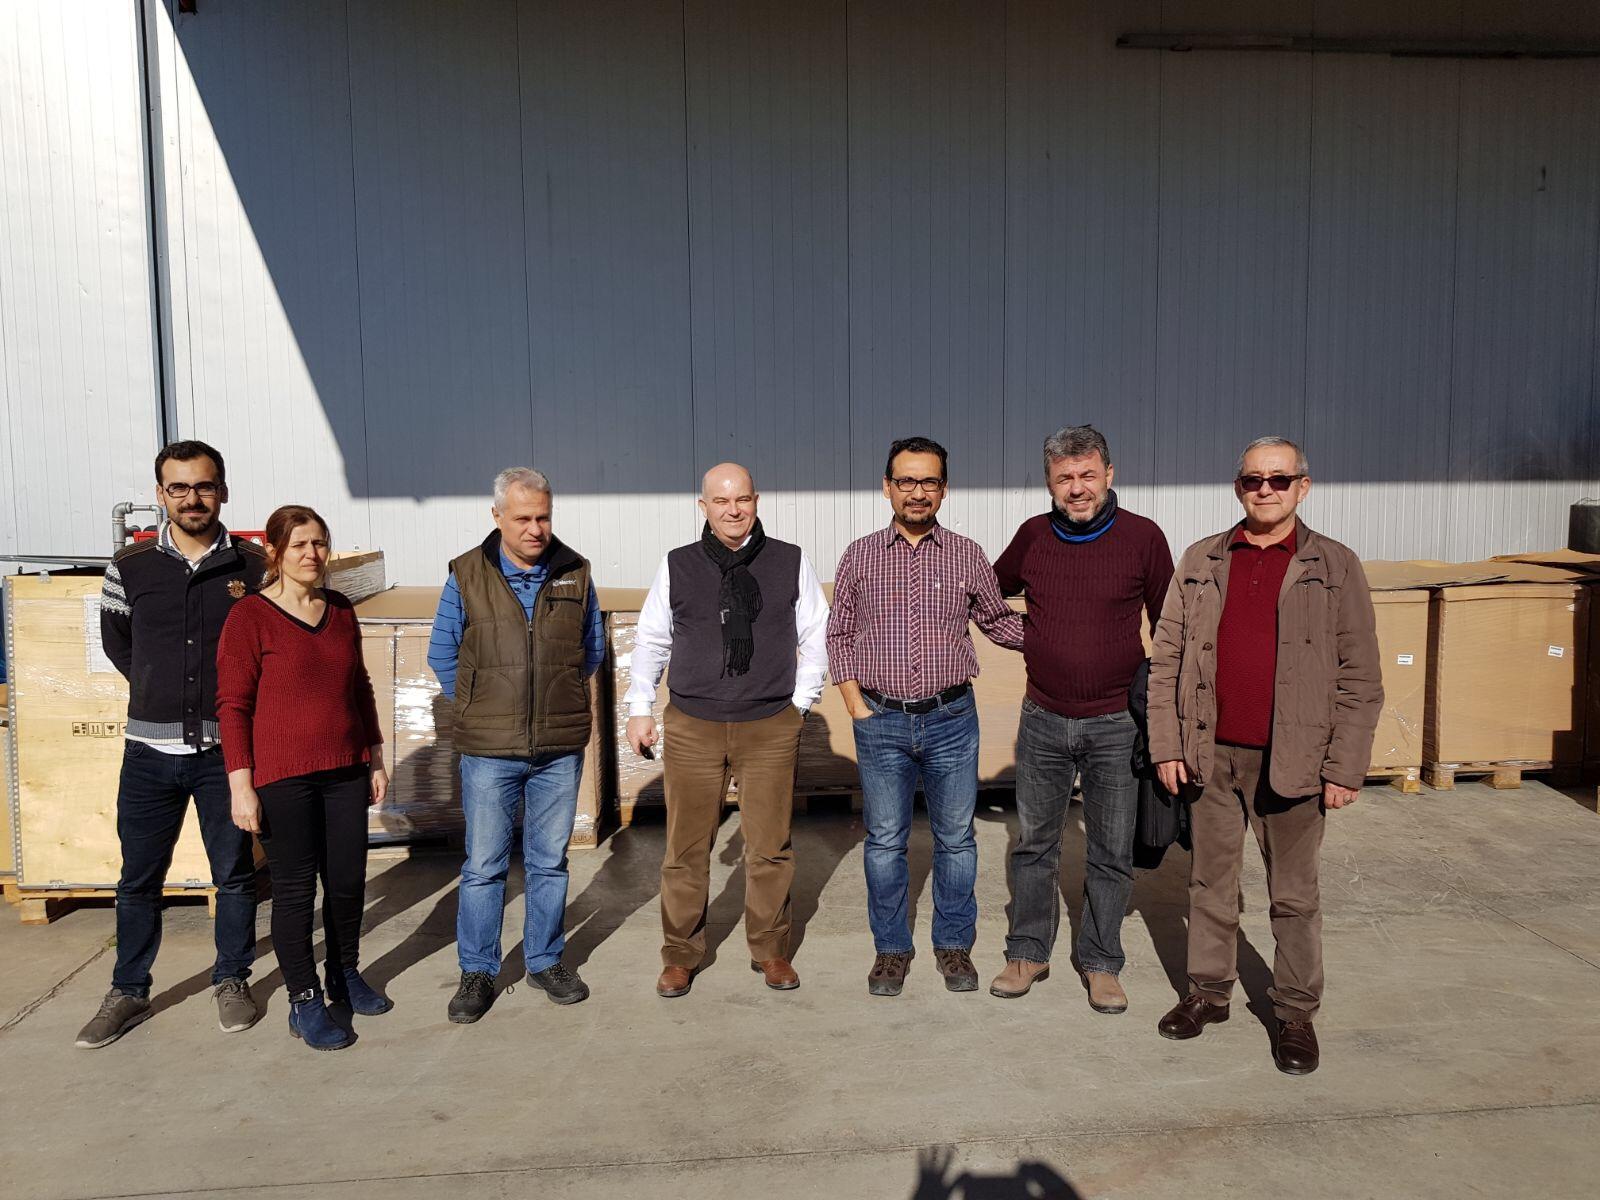 IMECO TP Electric Fabrika Tesisi tasarim projesini basari ile bitirdi